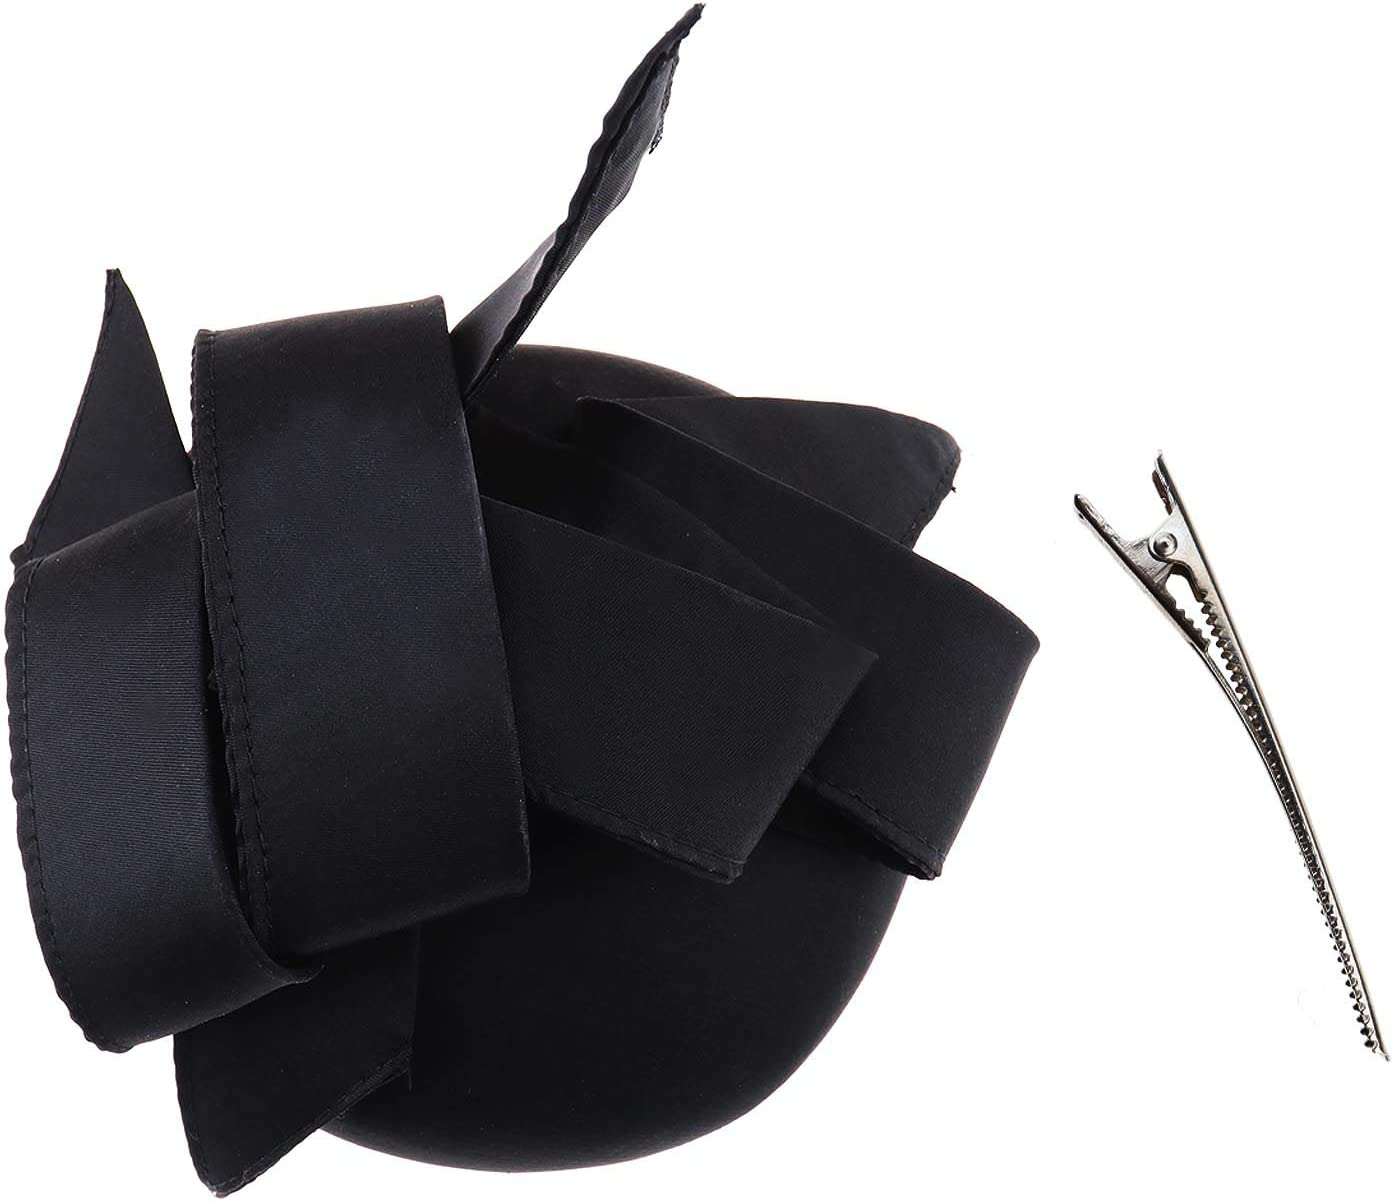 Creative-Idea Elegant Headband Fascinator Headwear Ladies Race Royal Ascot Pillbox Cocktail Party Derby Hat Black